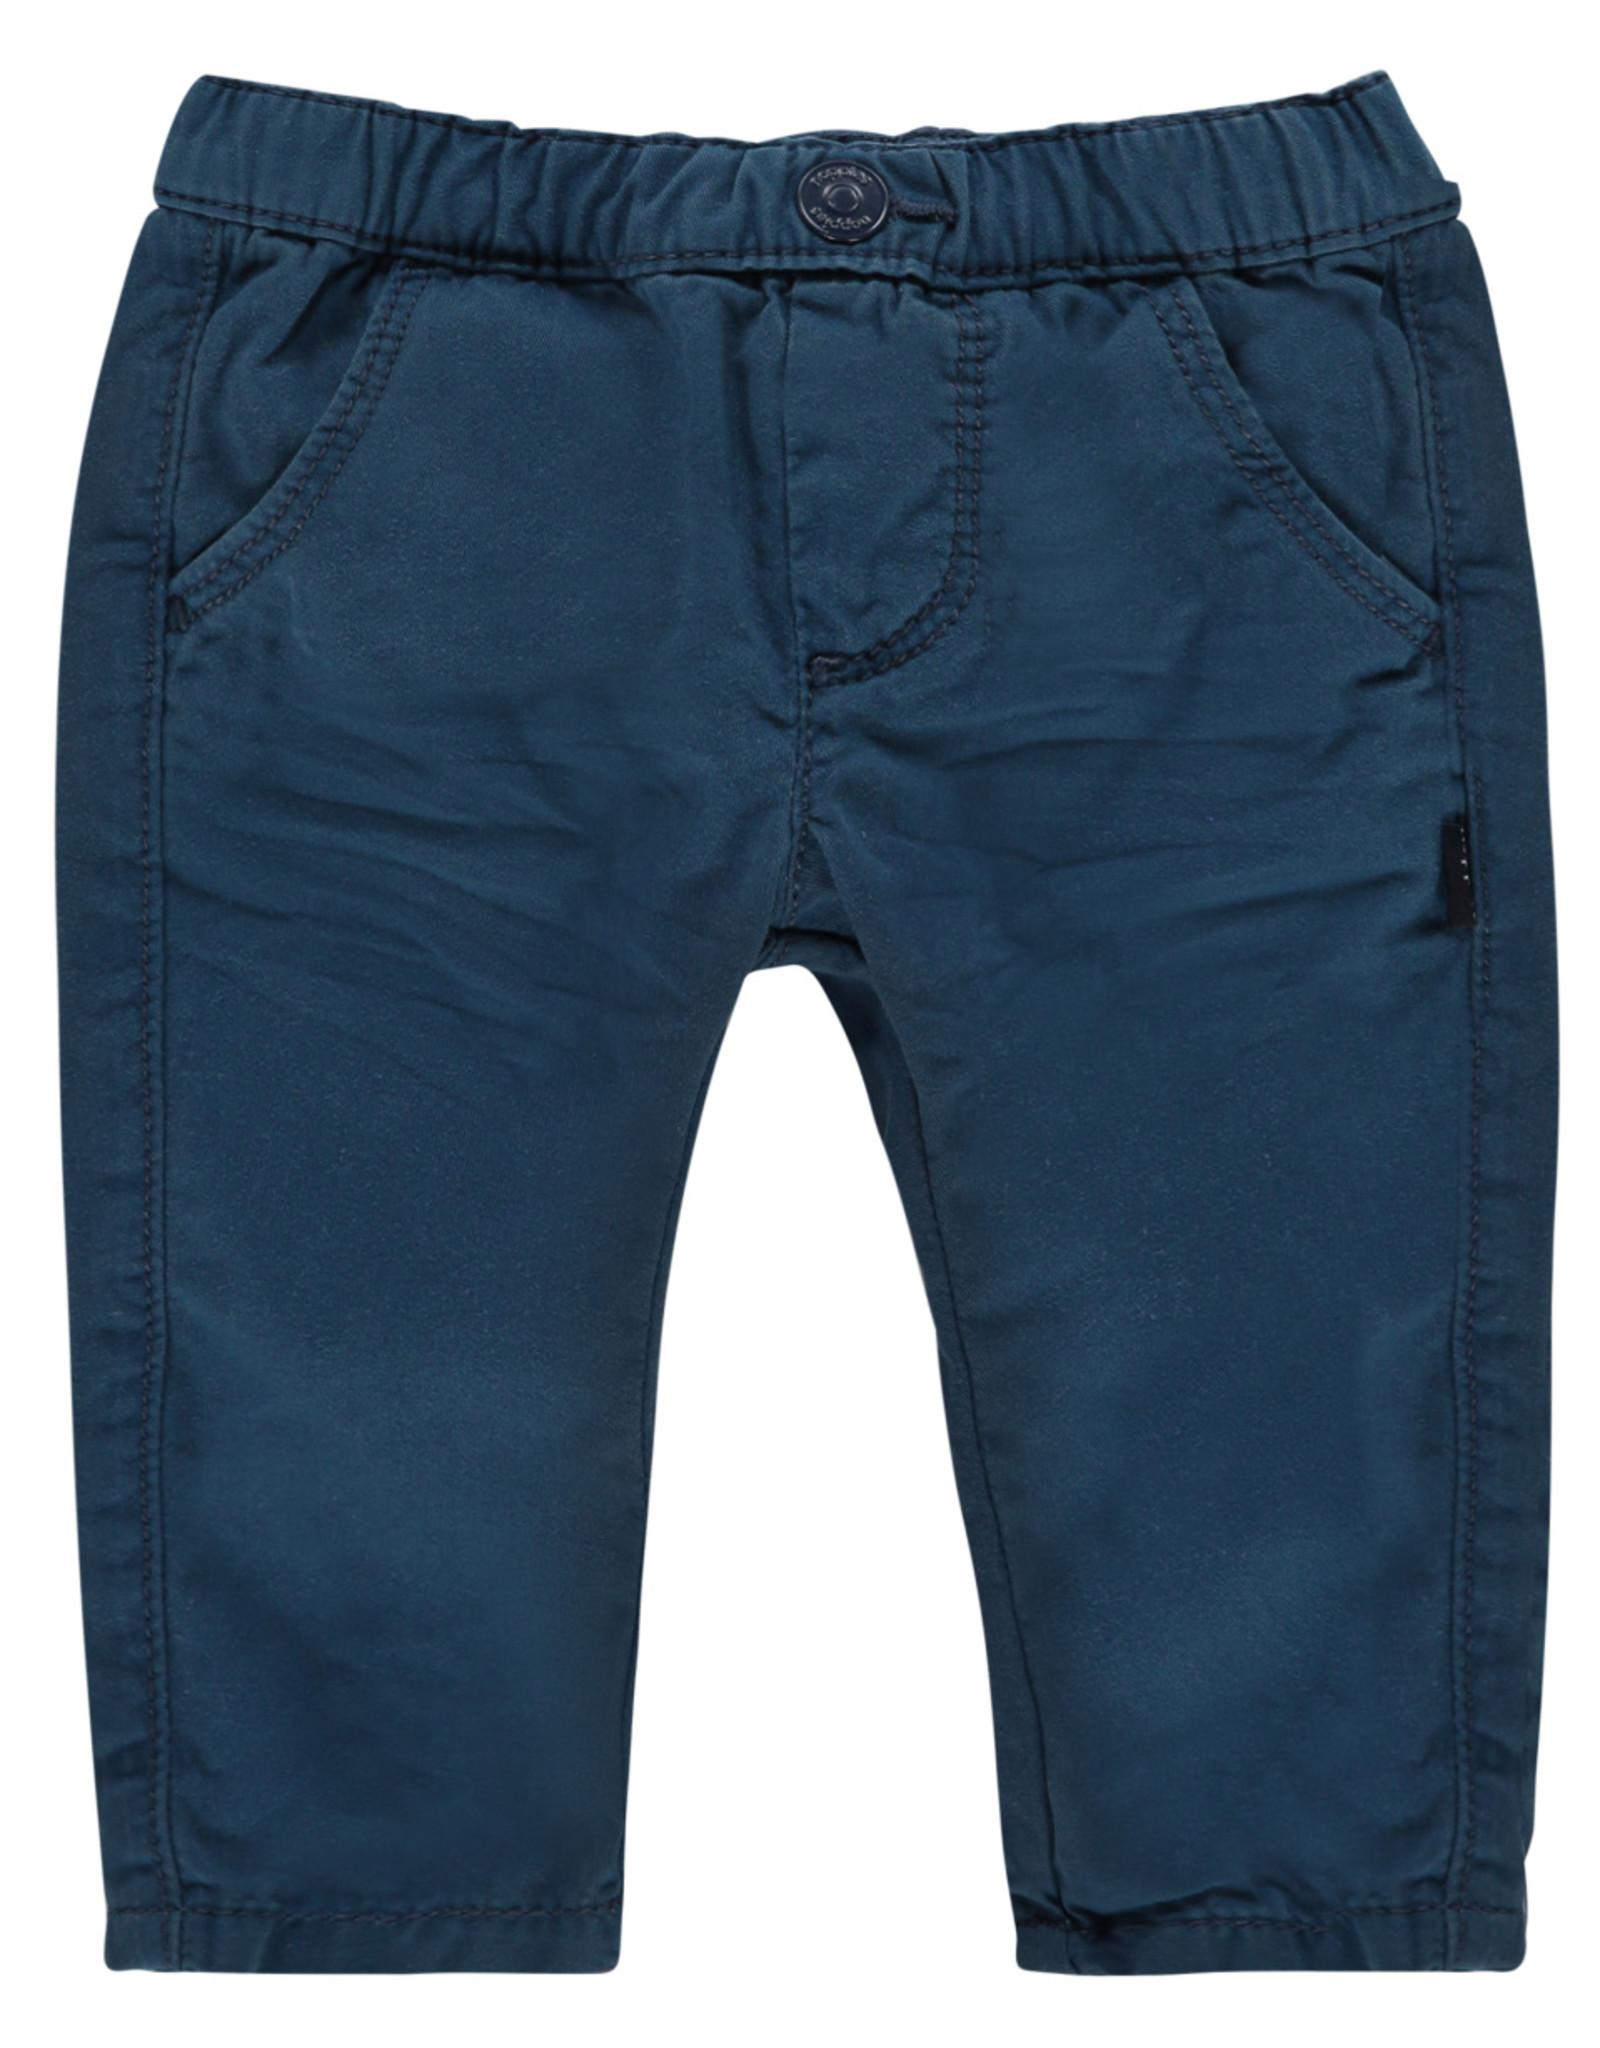 Noppies Noppies B Regular fit 5-pocket pants Moberly DARK DENIM